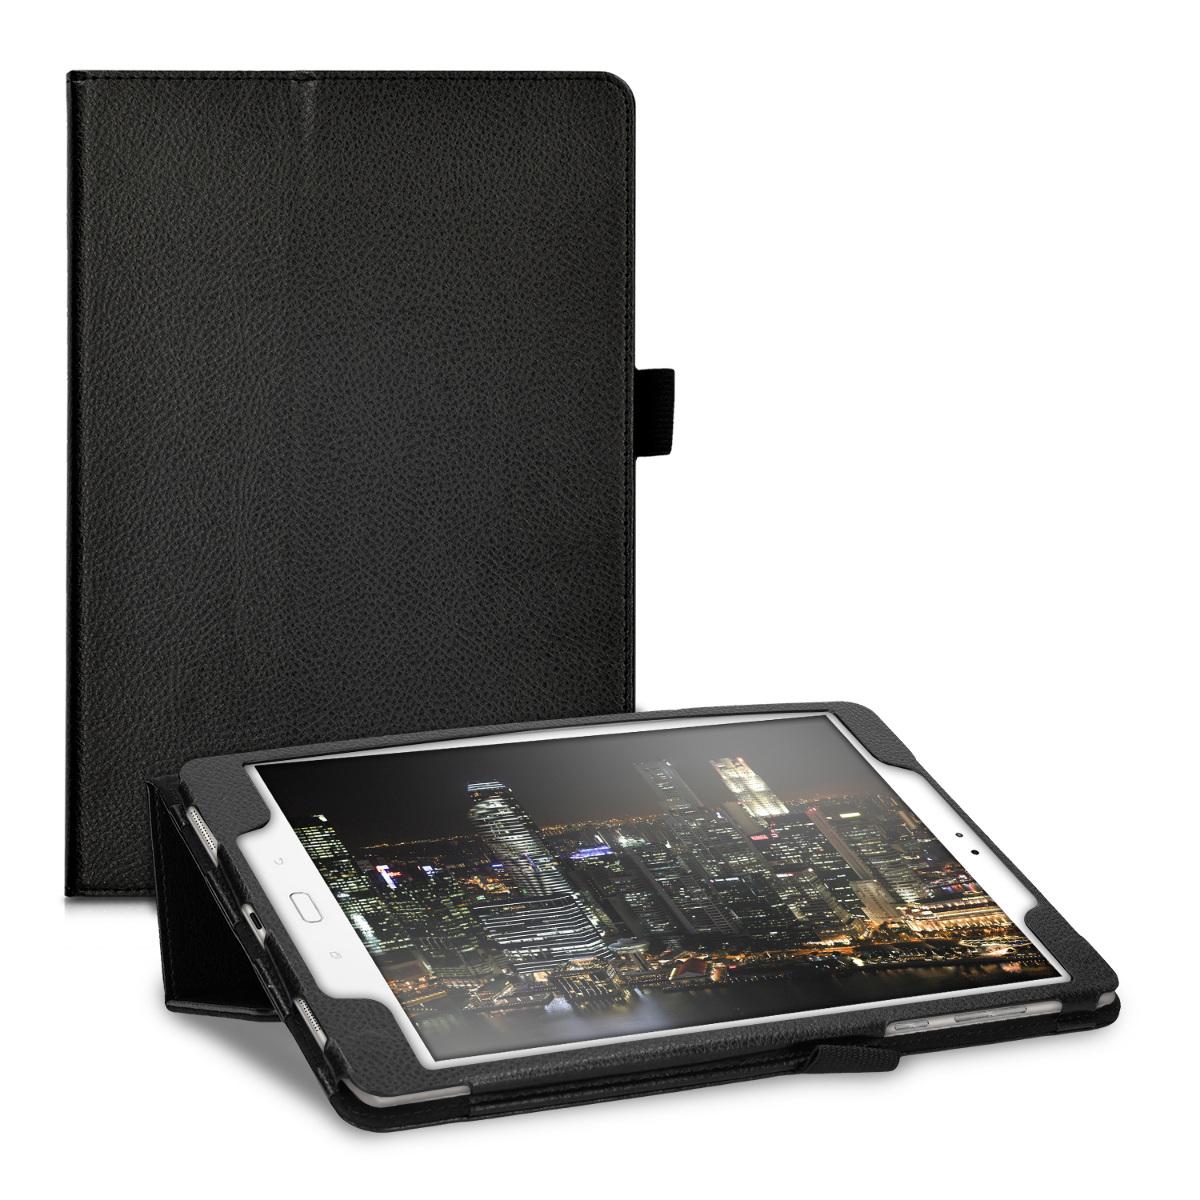 CUSTODIA-PER-ASUS-ZENPAD-3S-10-Z500M-COVER-TABLET-STAND-CASE